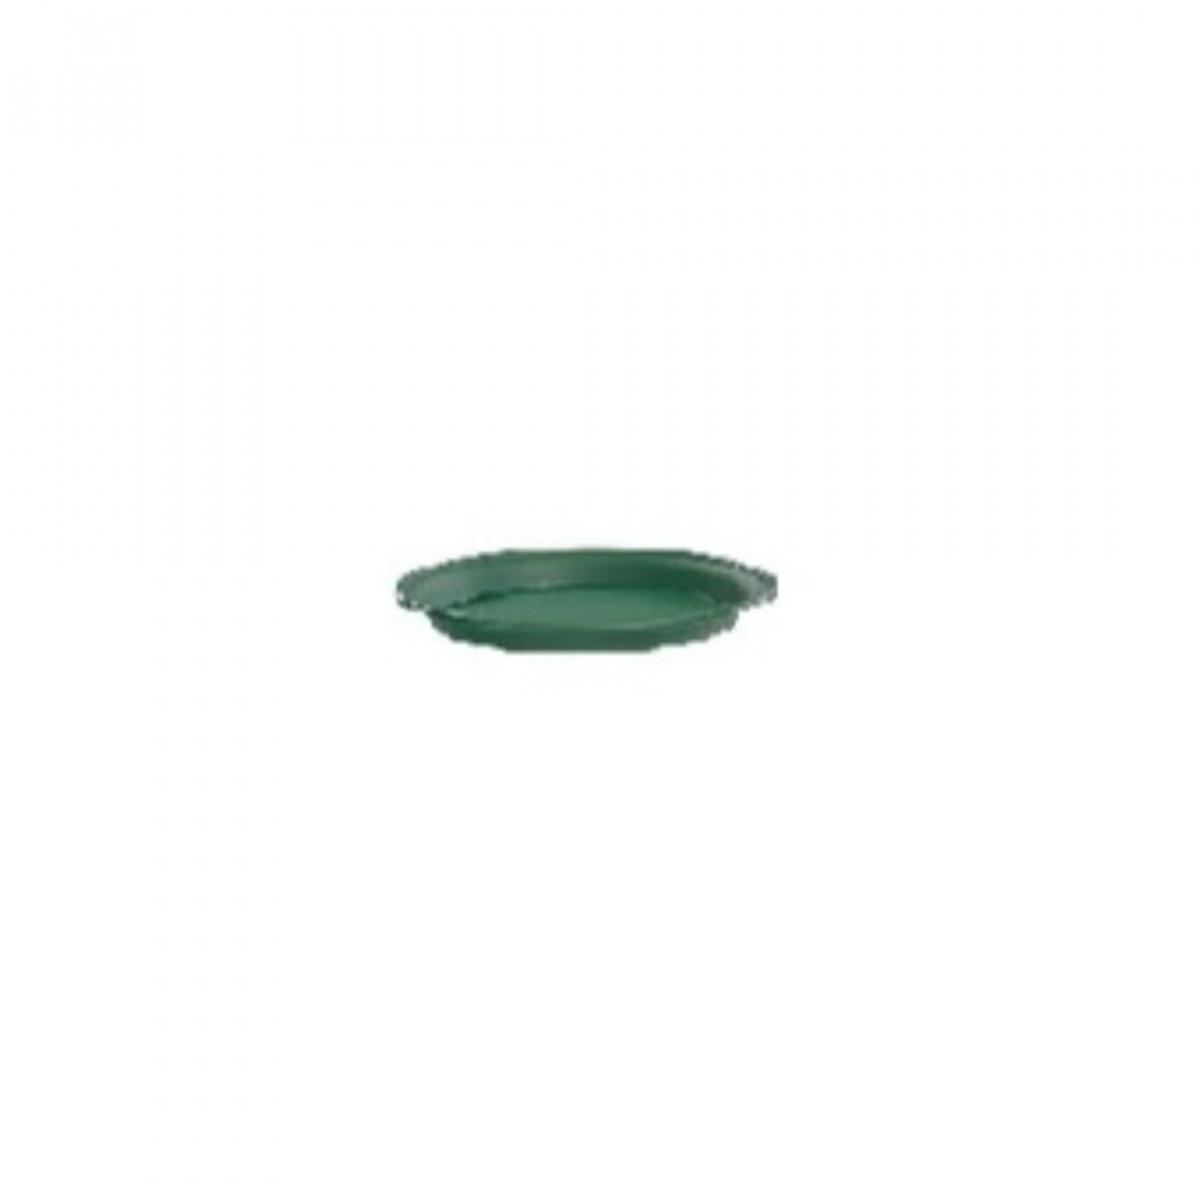 10CM Plastic Tray Green - 10 No